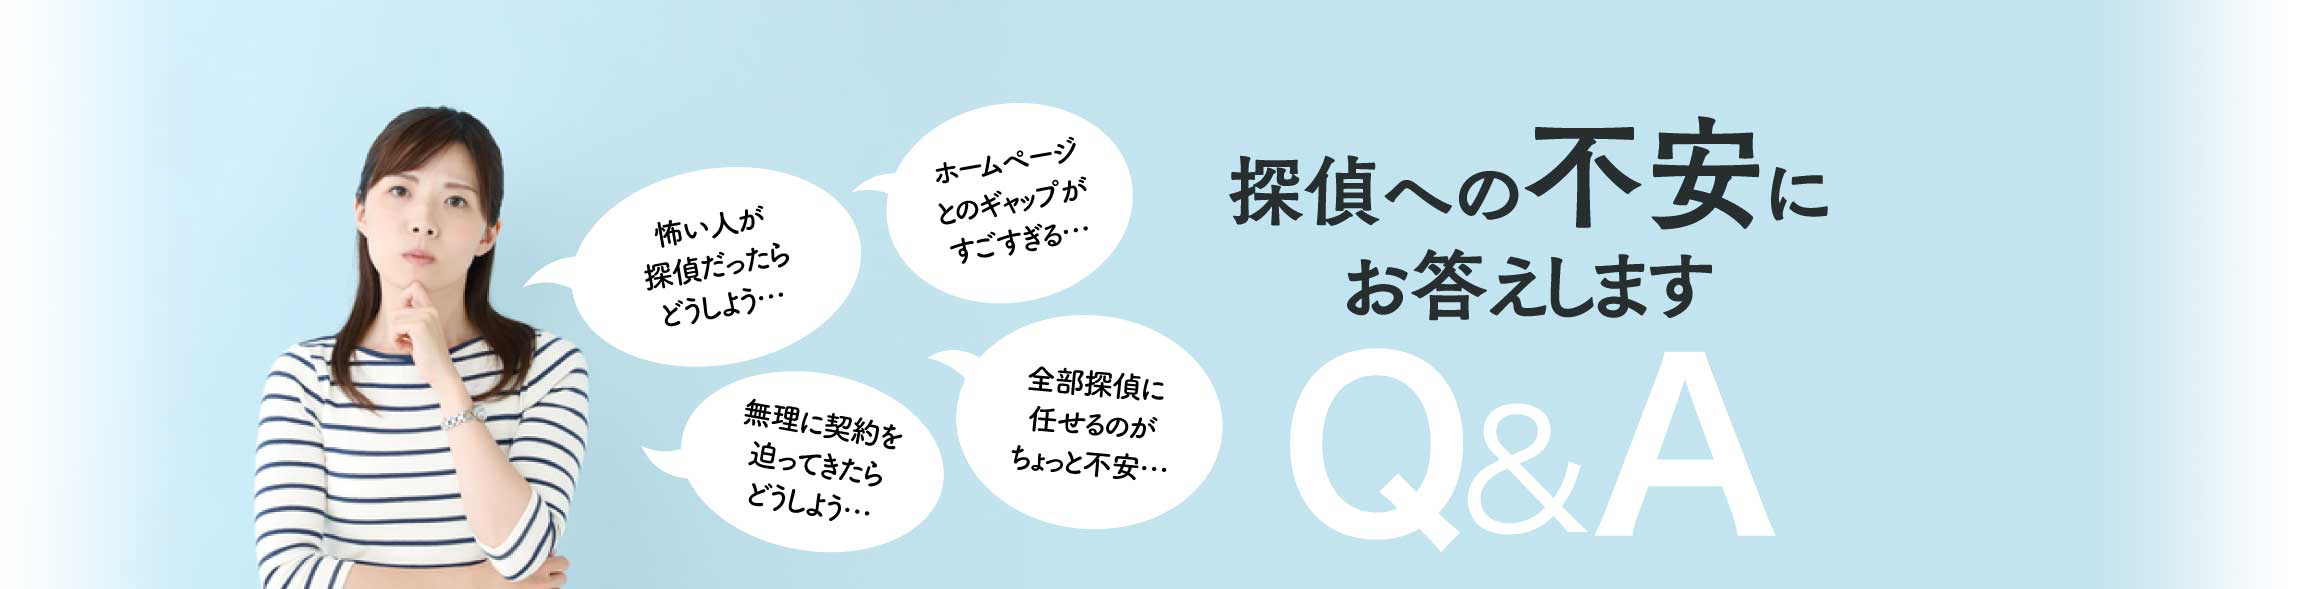 名古屋の探偵・興信所